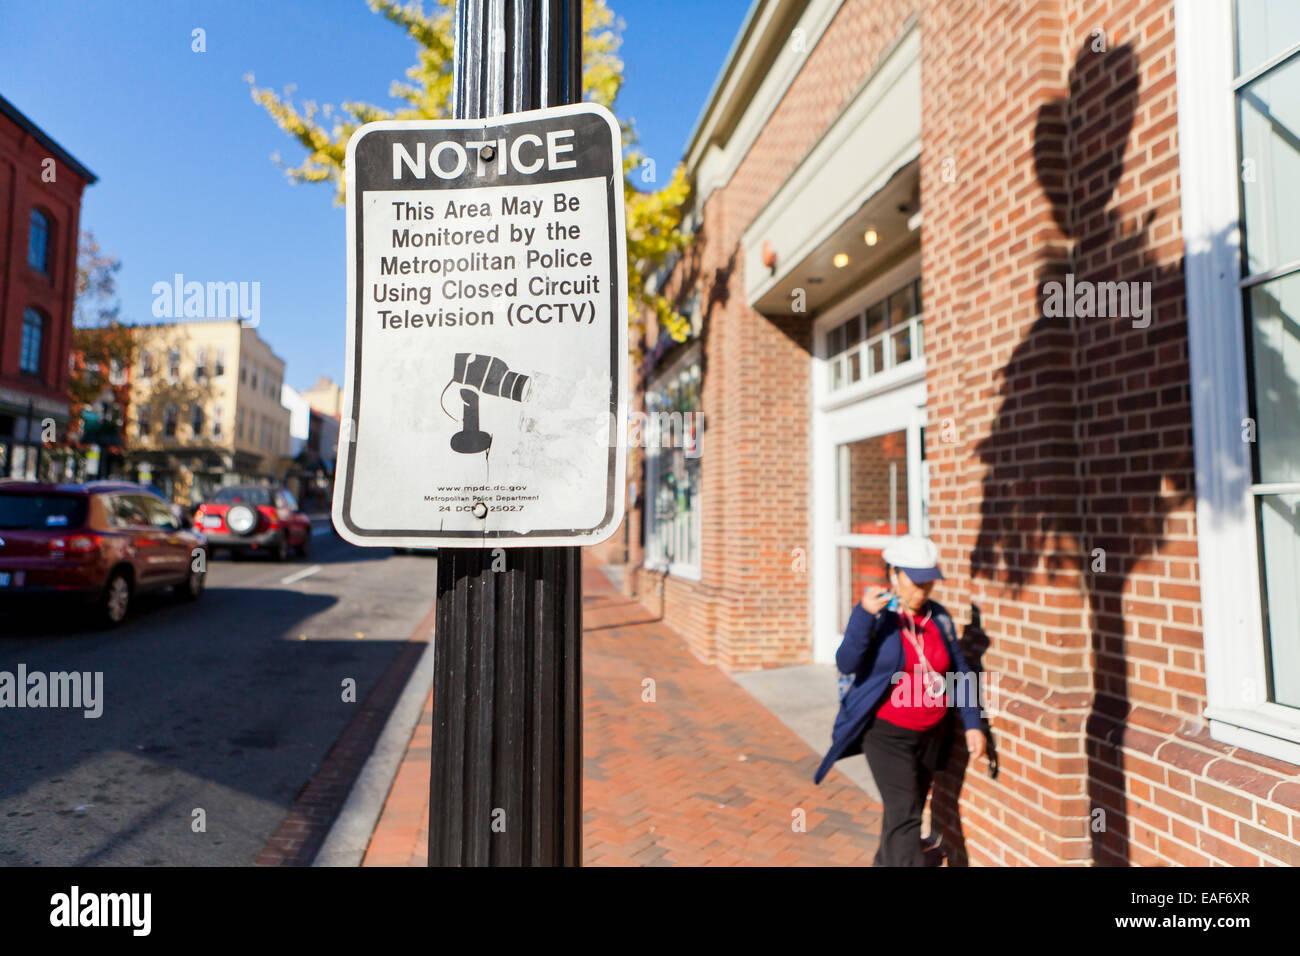 Police CCTV usage notice on public walkway - Washington, DC USA - Stock Image